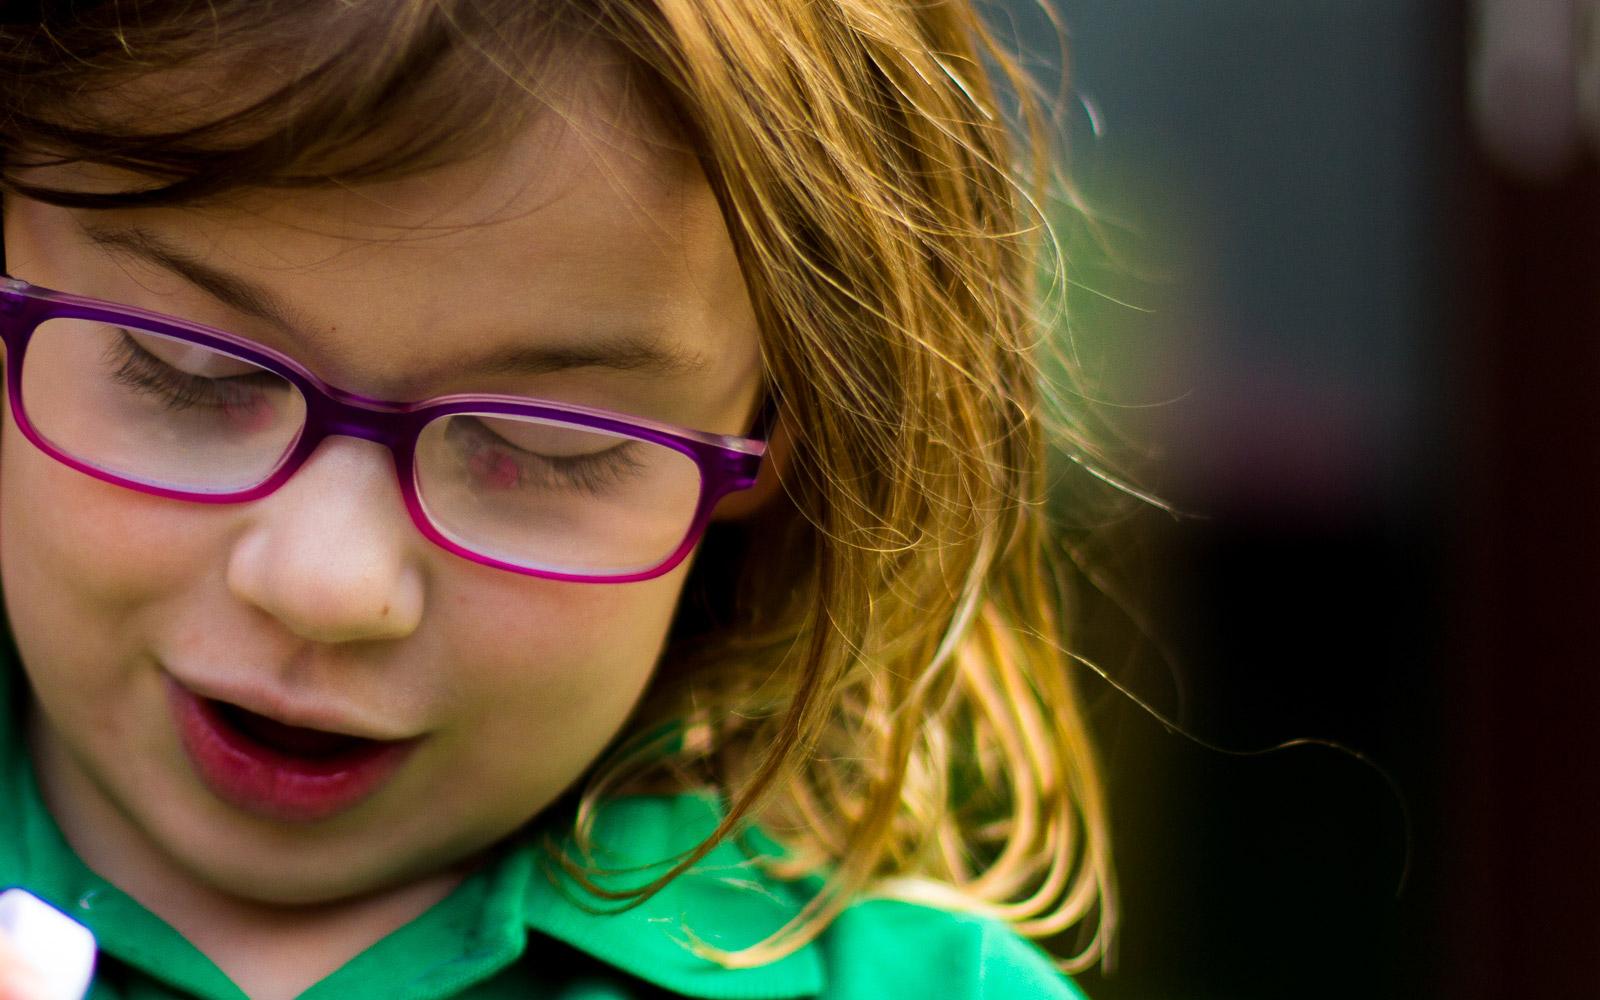 Mel Hudson Childrens Photographer, location at home photo shoot Carrickfergus